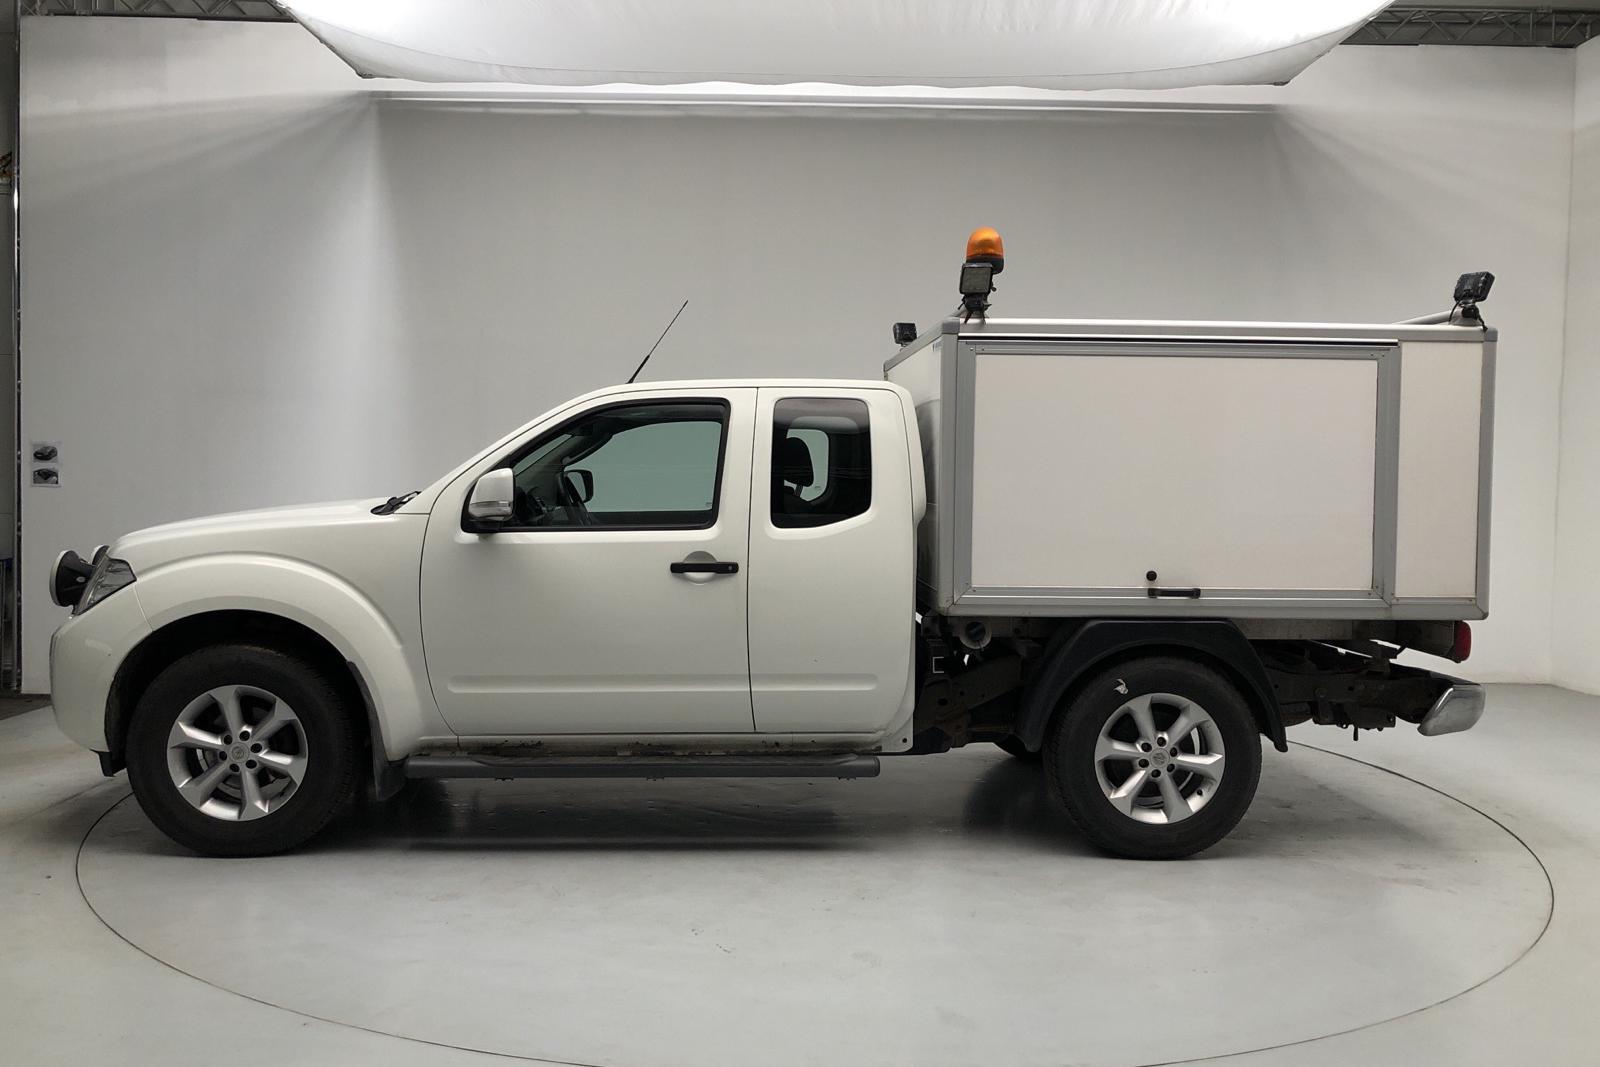 Nissan Navara 2.5 dCi (190hk) - 0 mil - Manuell - vit - 2012